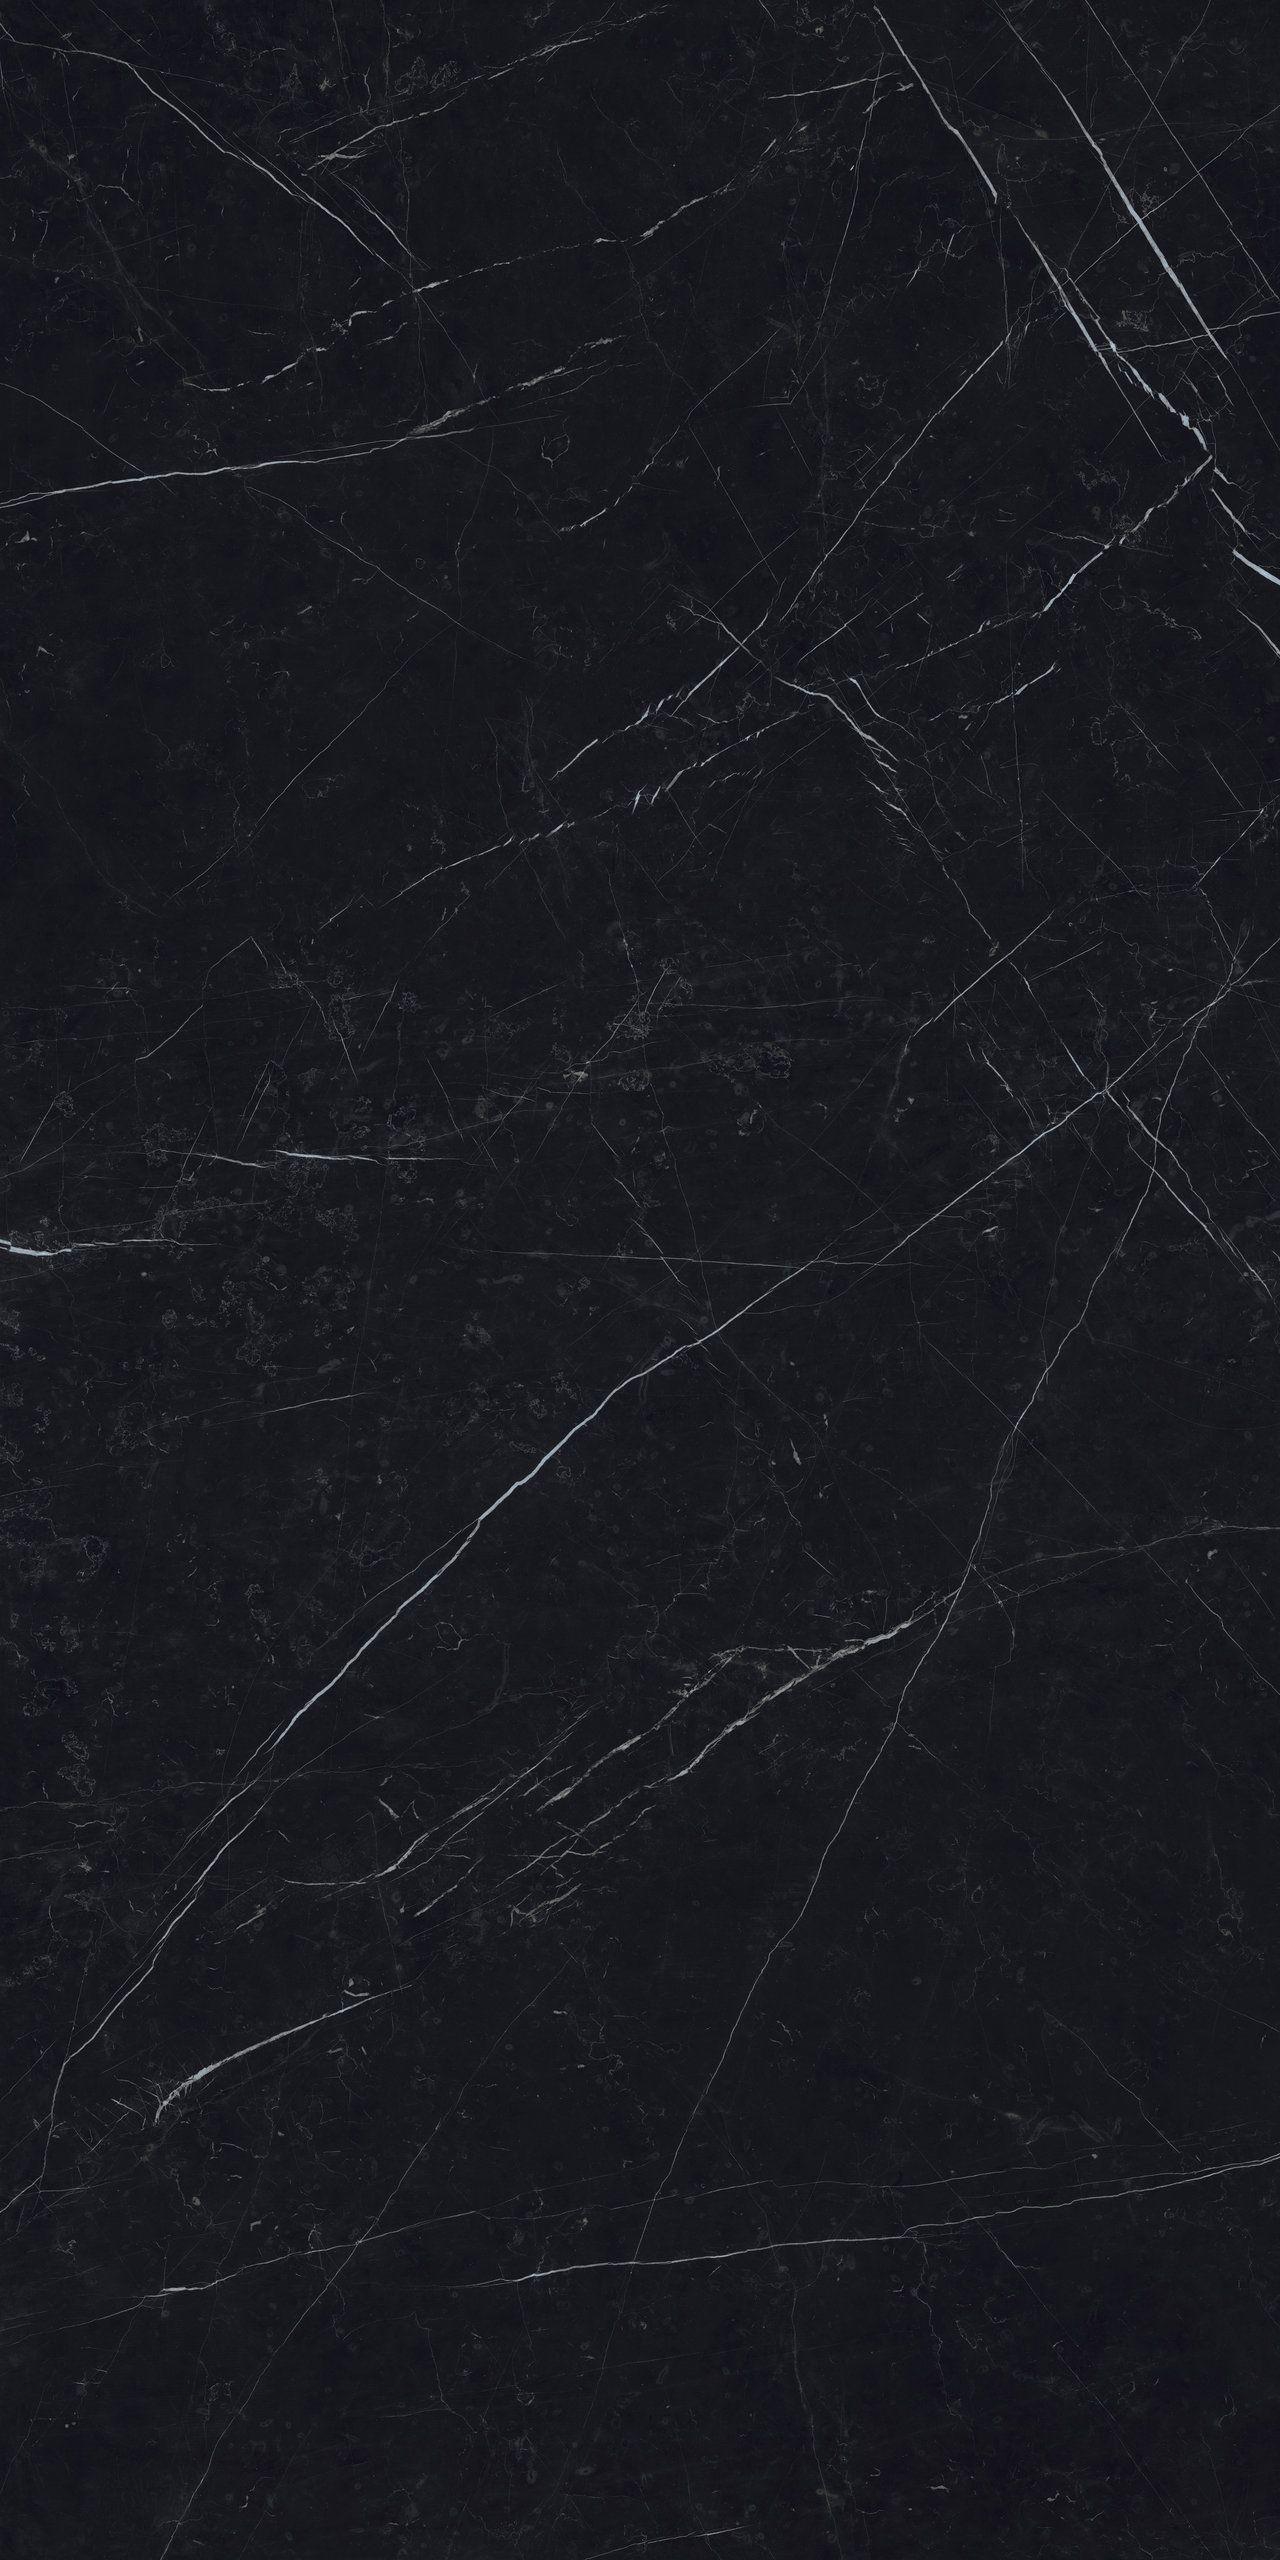 Dark marquina Marmi maximum, black marble/granite effect floor and wall coverings